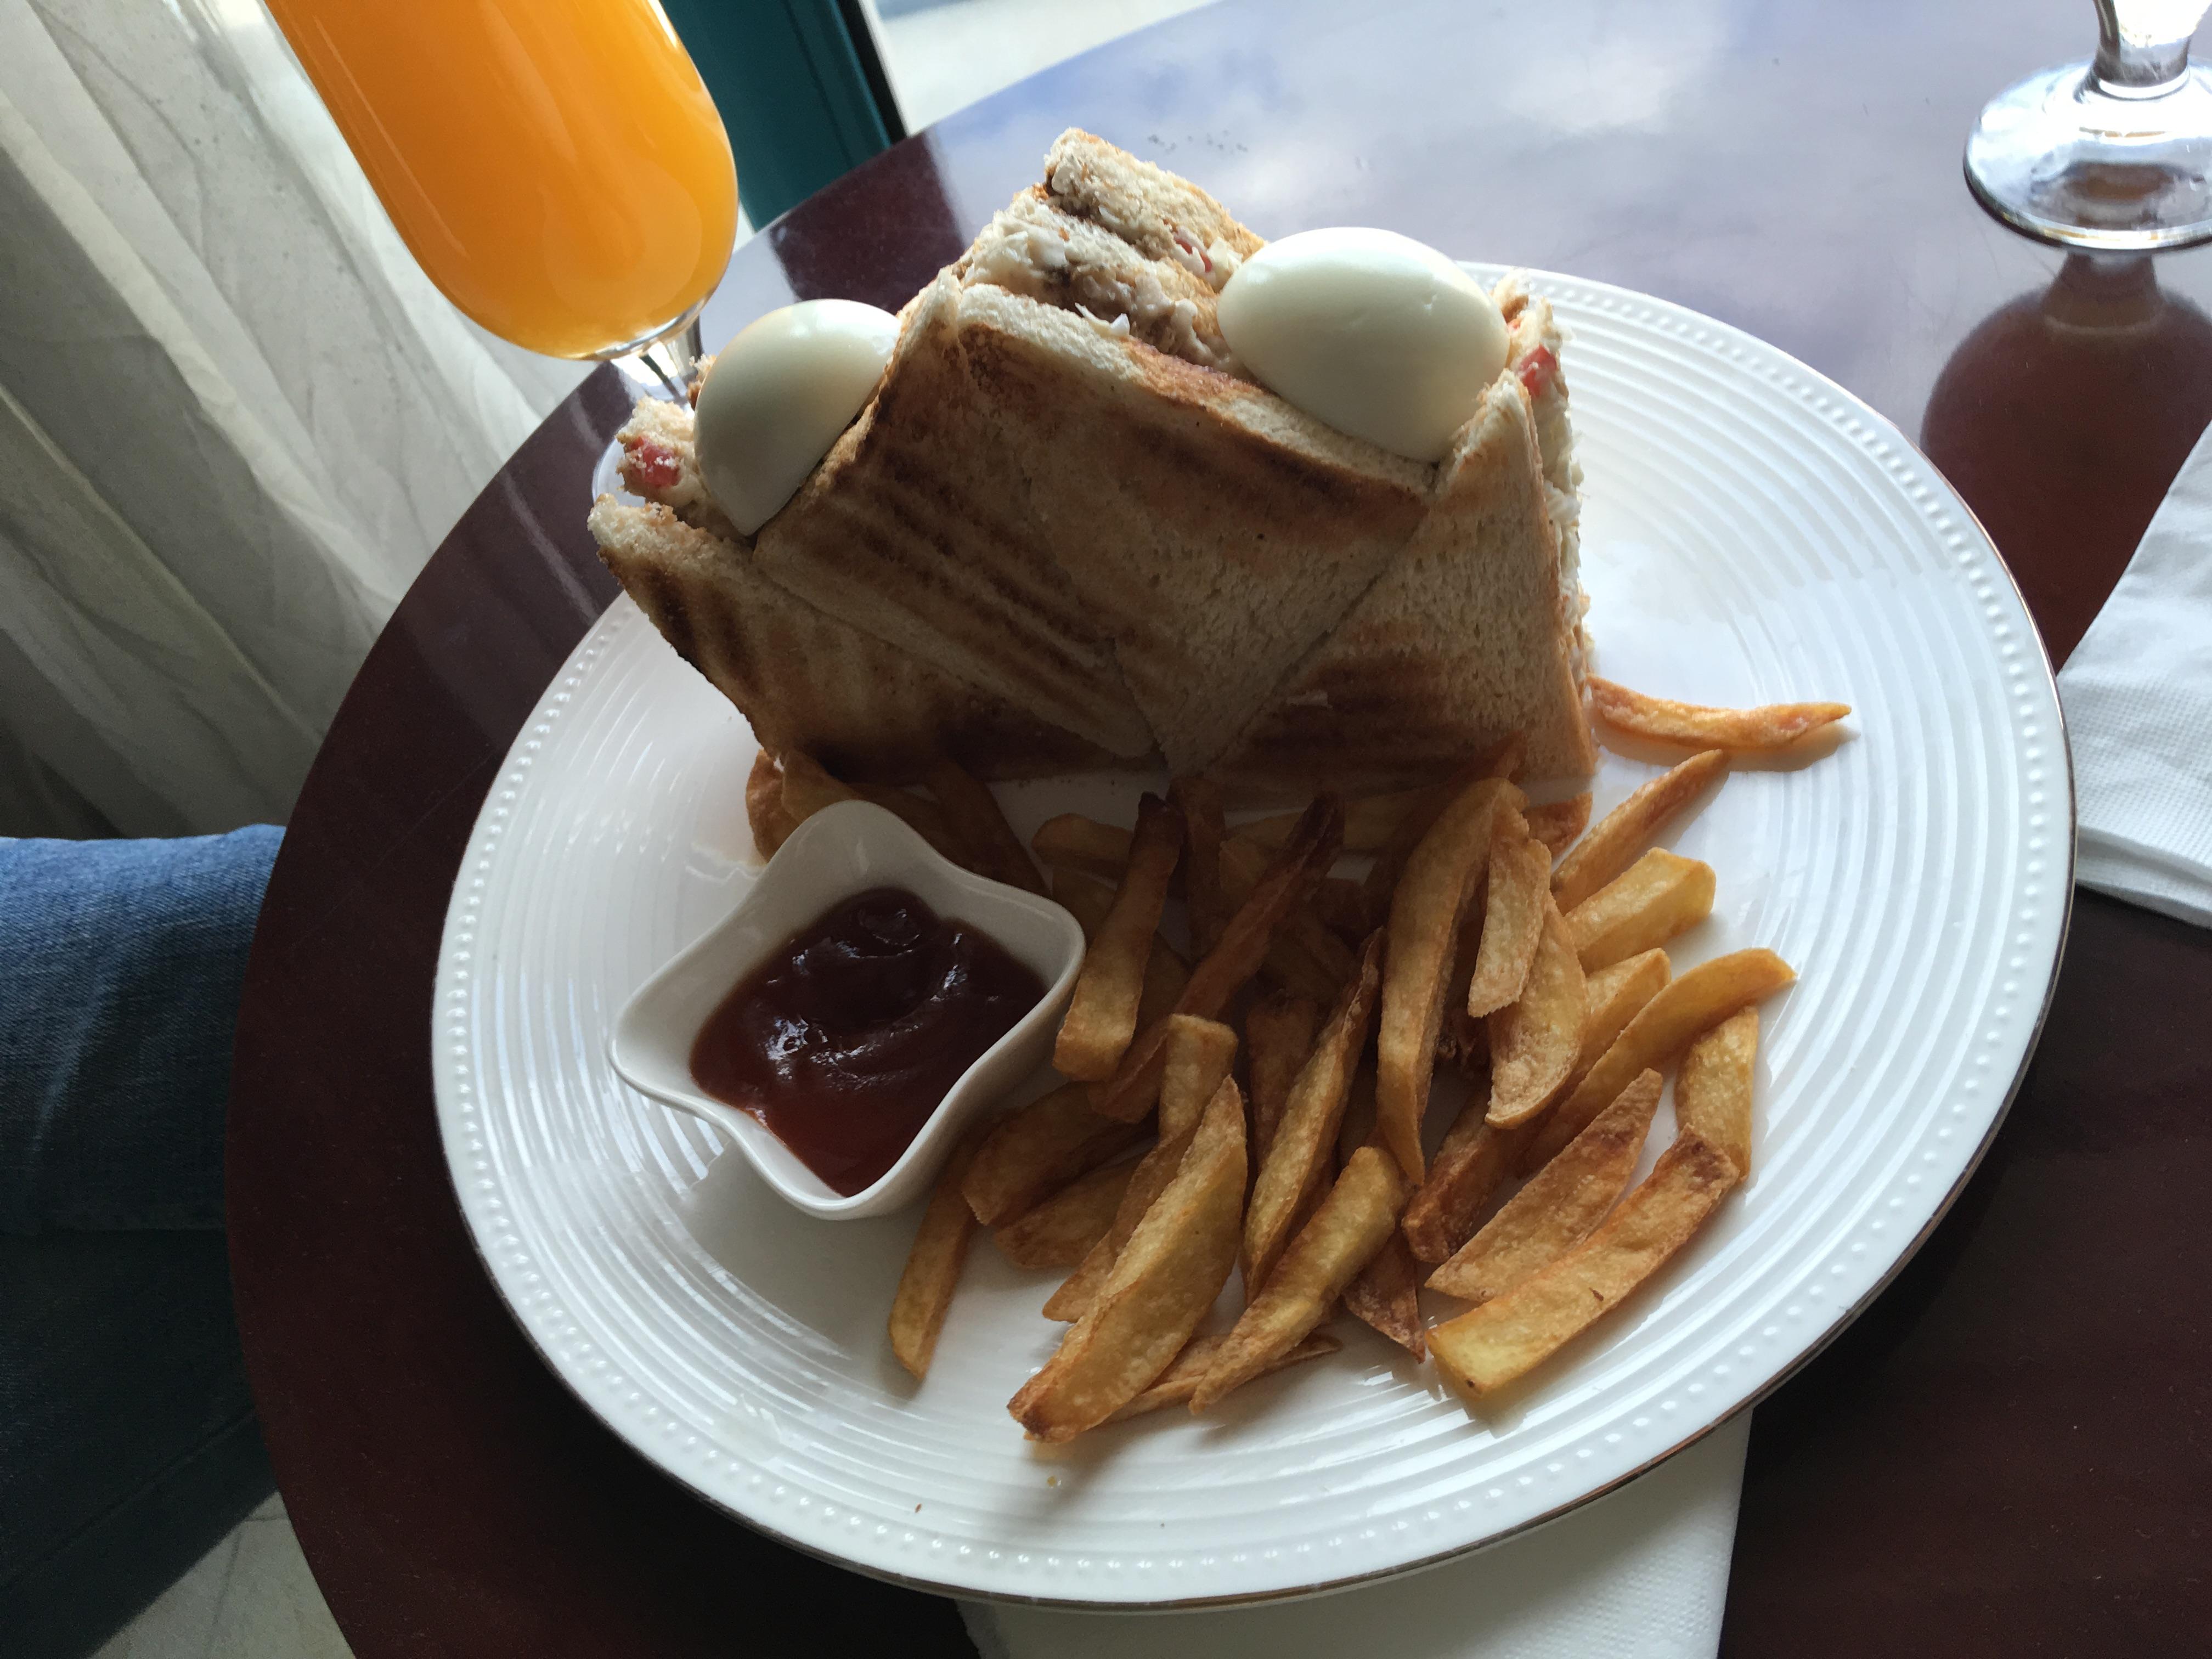 http://foodloader.net/blub_2018-01-03_Club_Sandwich_mit_Pommes.jpg